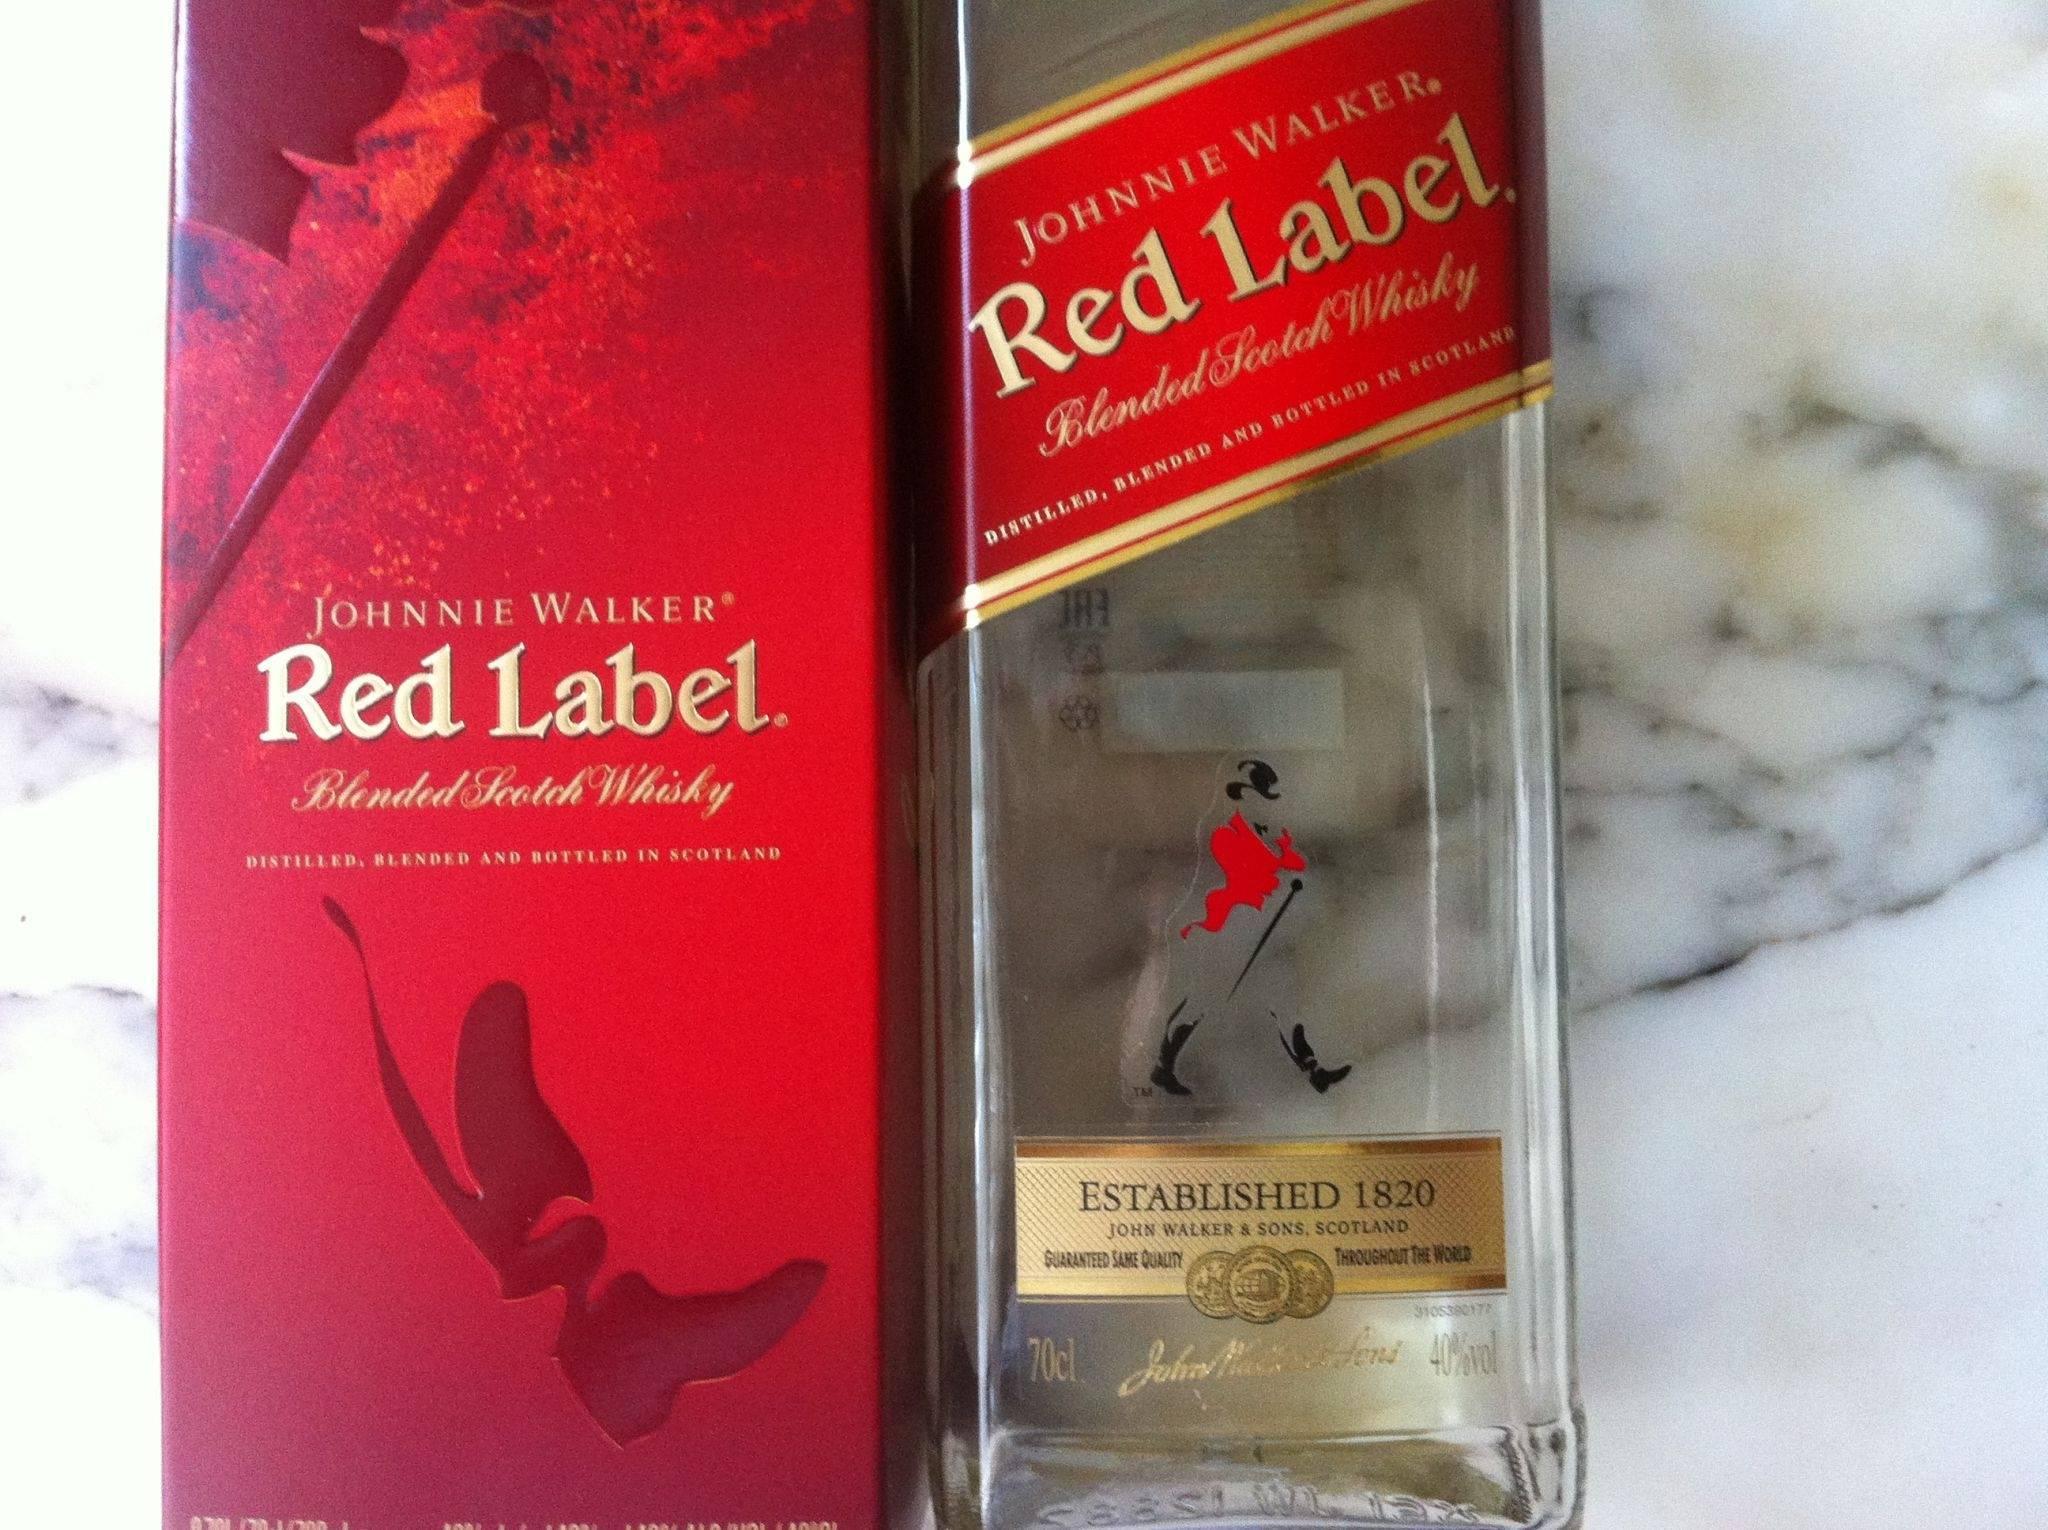 Обзор виски johnnie walker red label джонни уокер ред лейбл